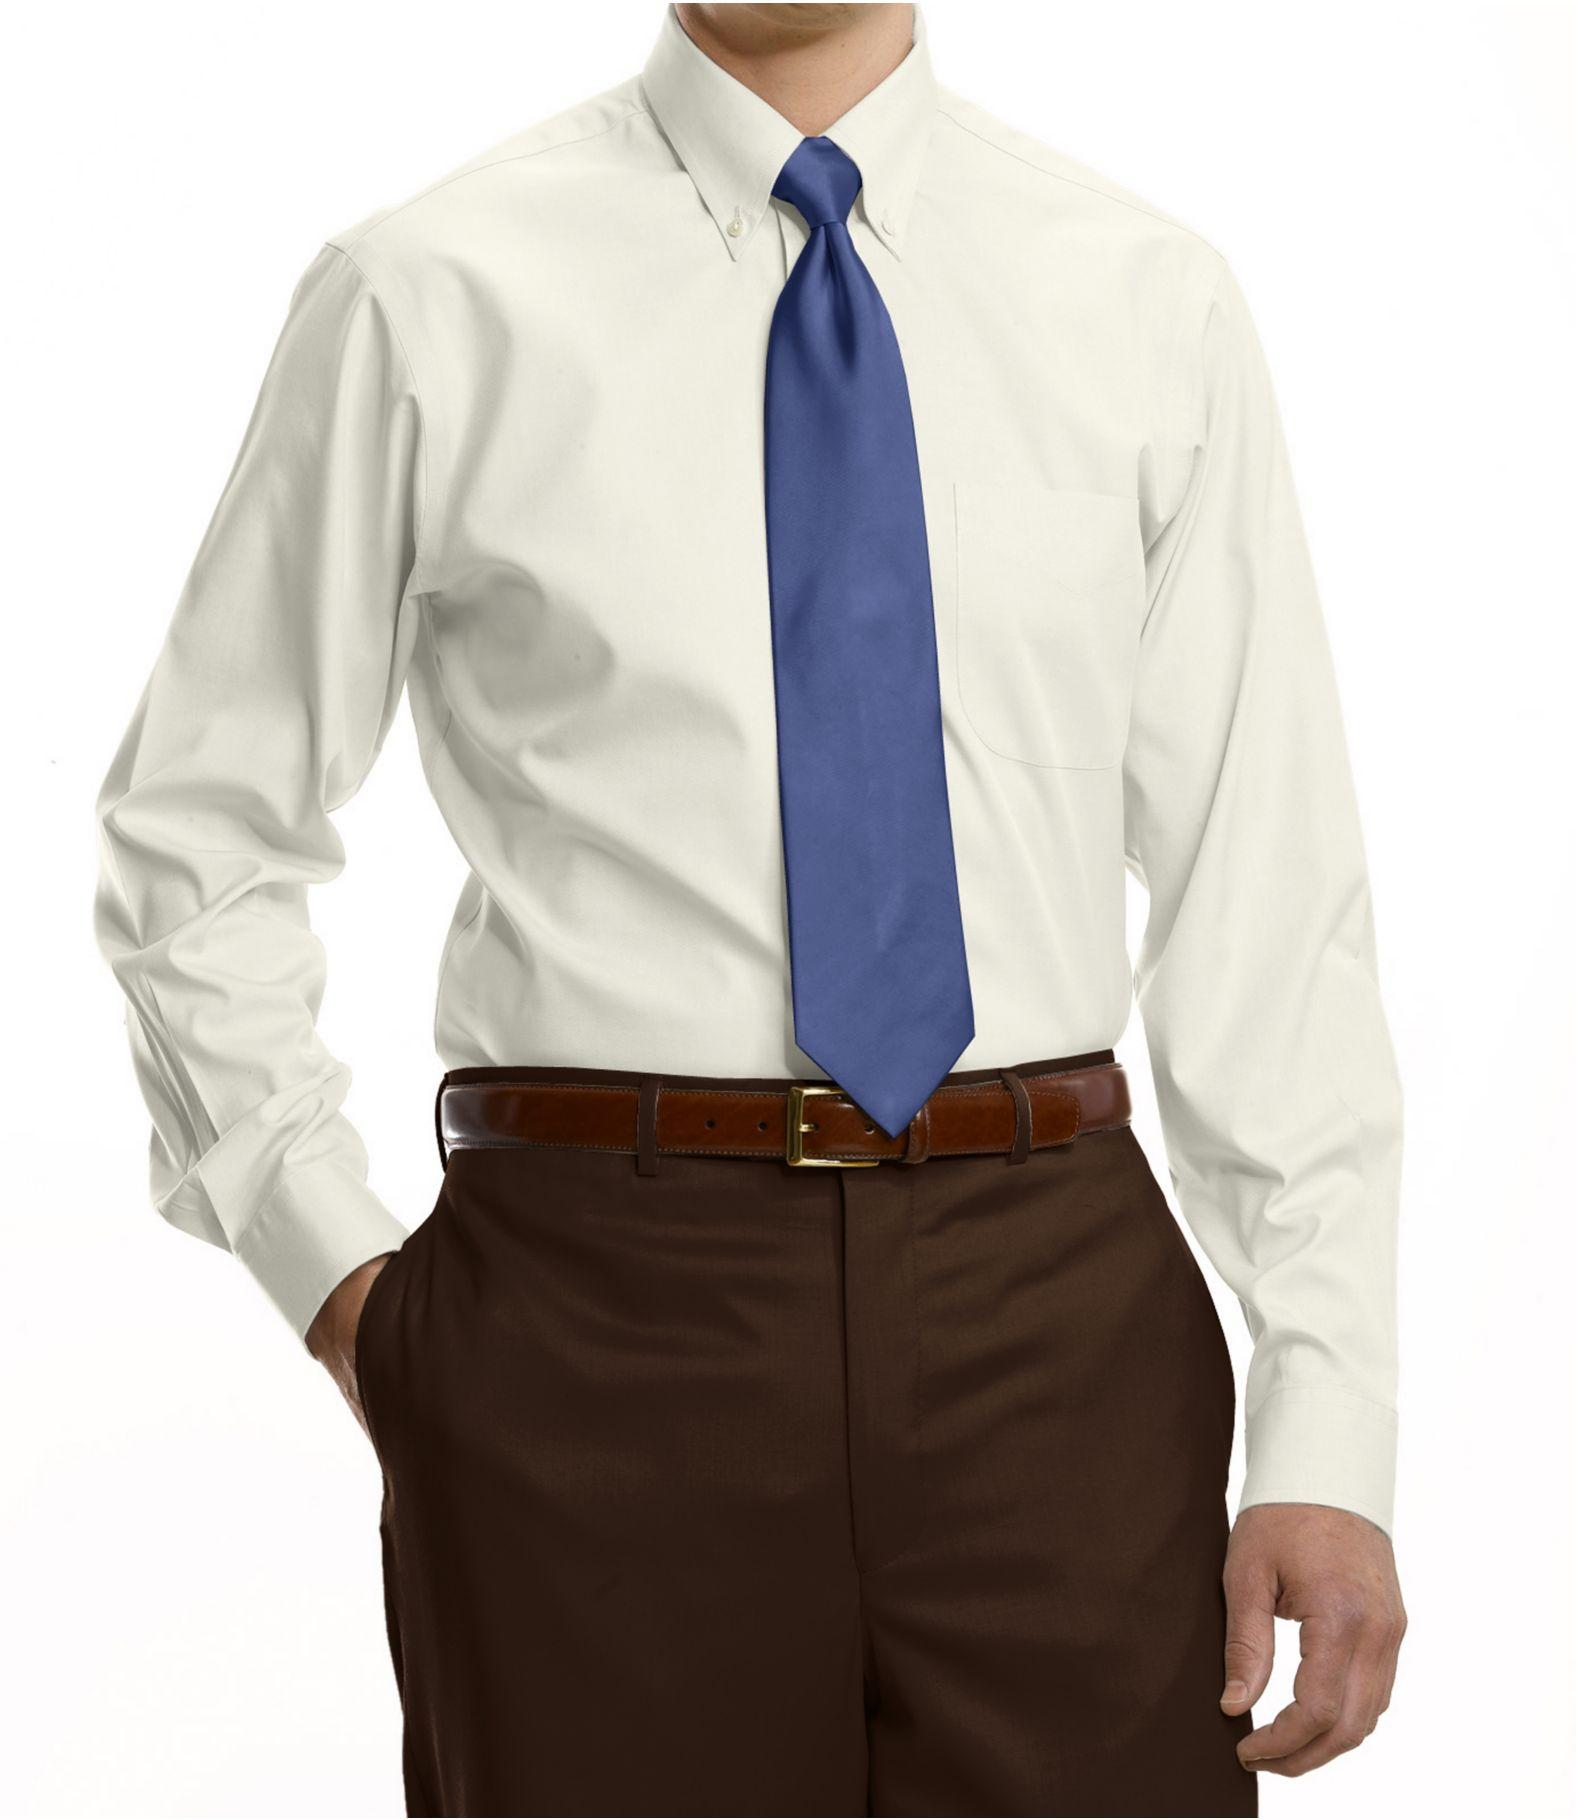 Traveler Collection Tailored Fit Button-Down Collar Dress Shirt ...